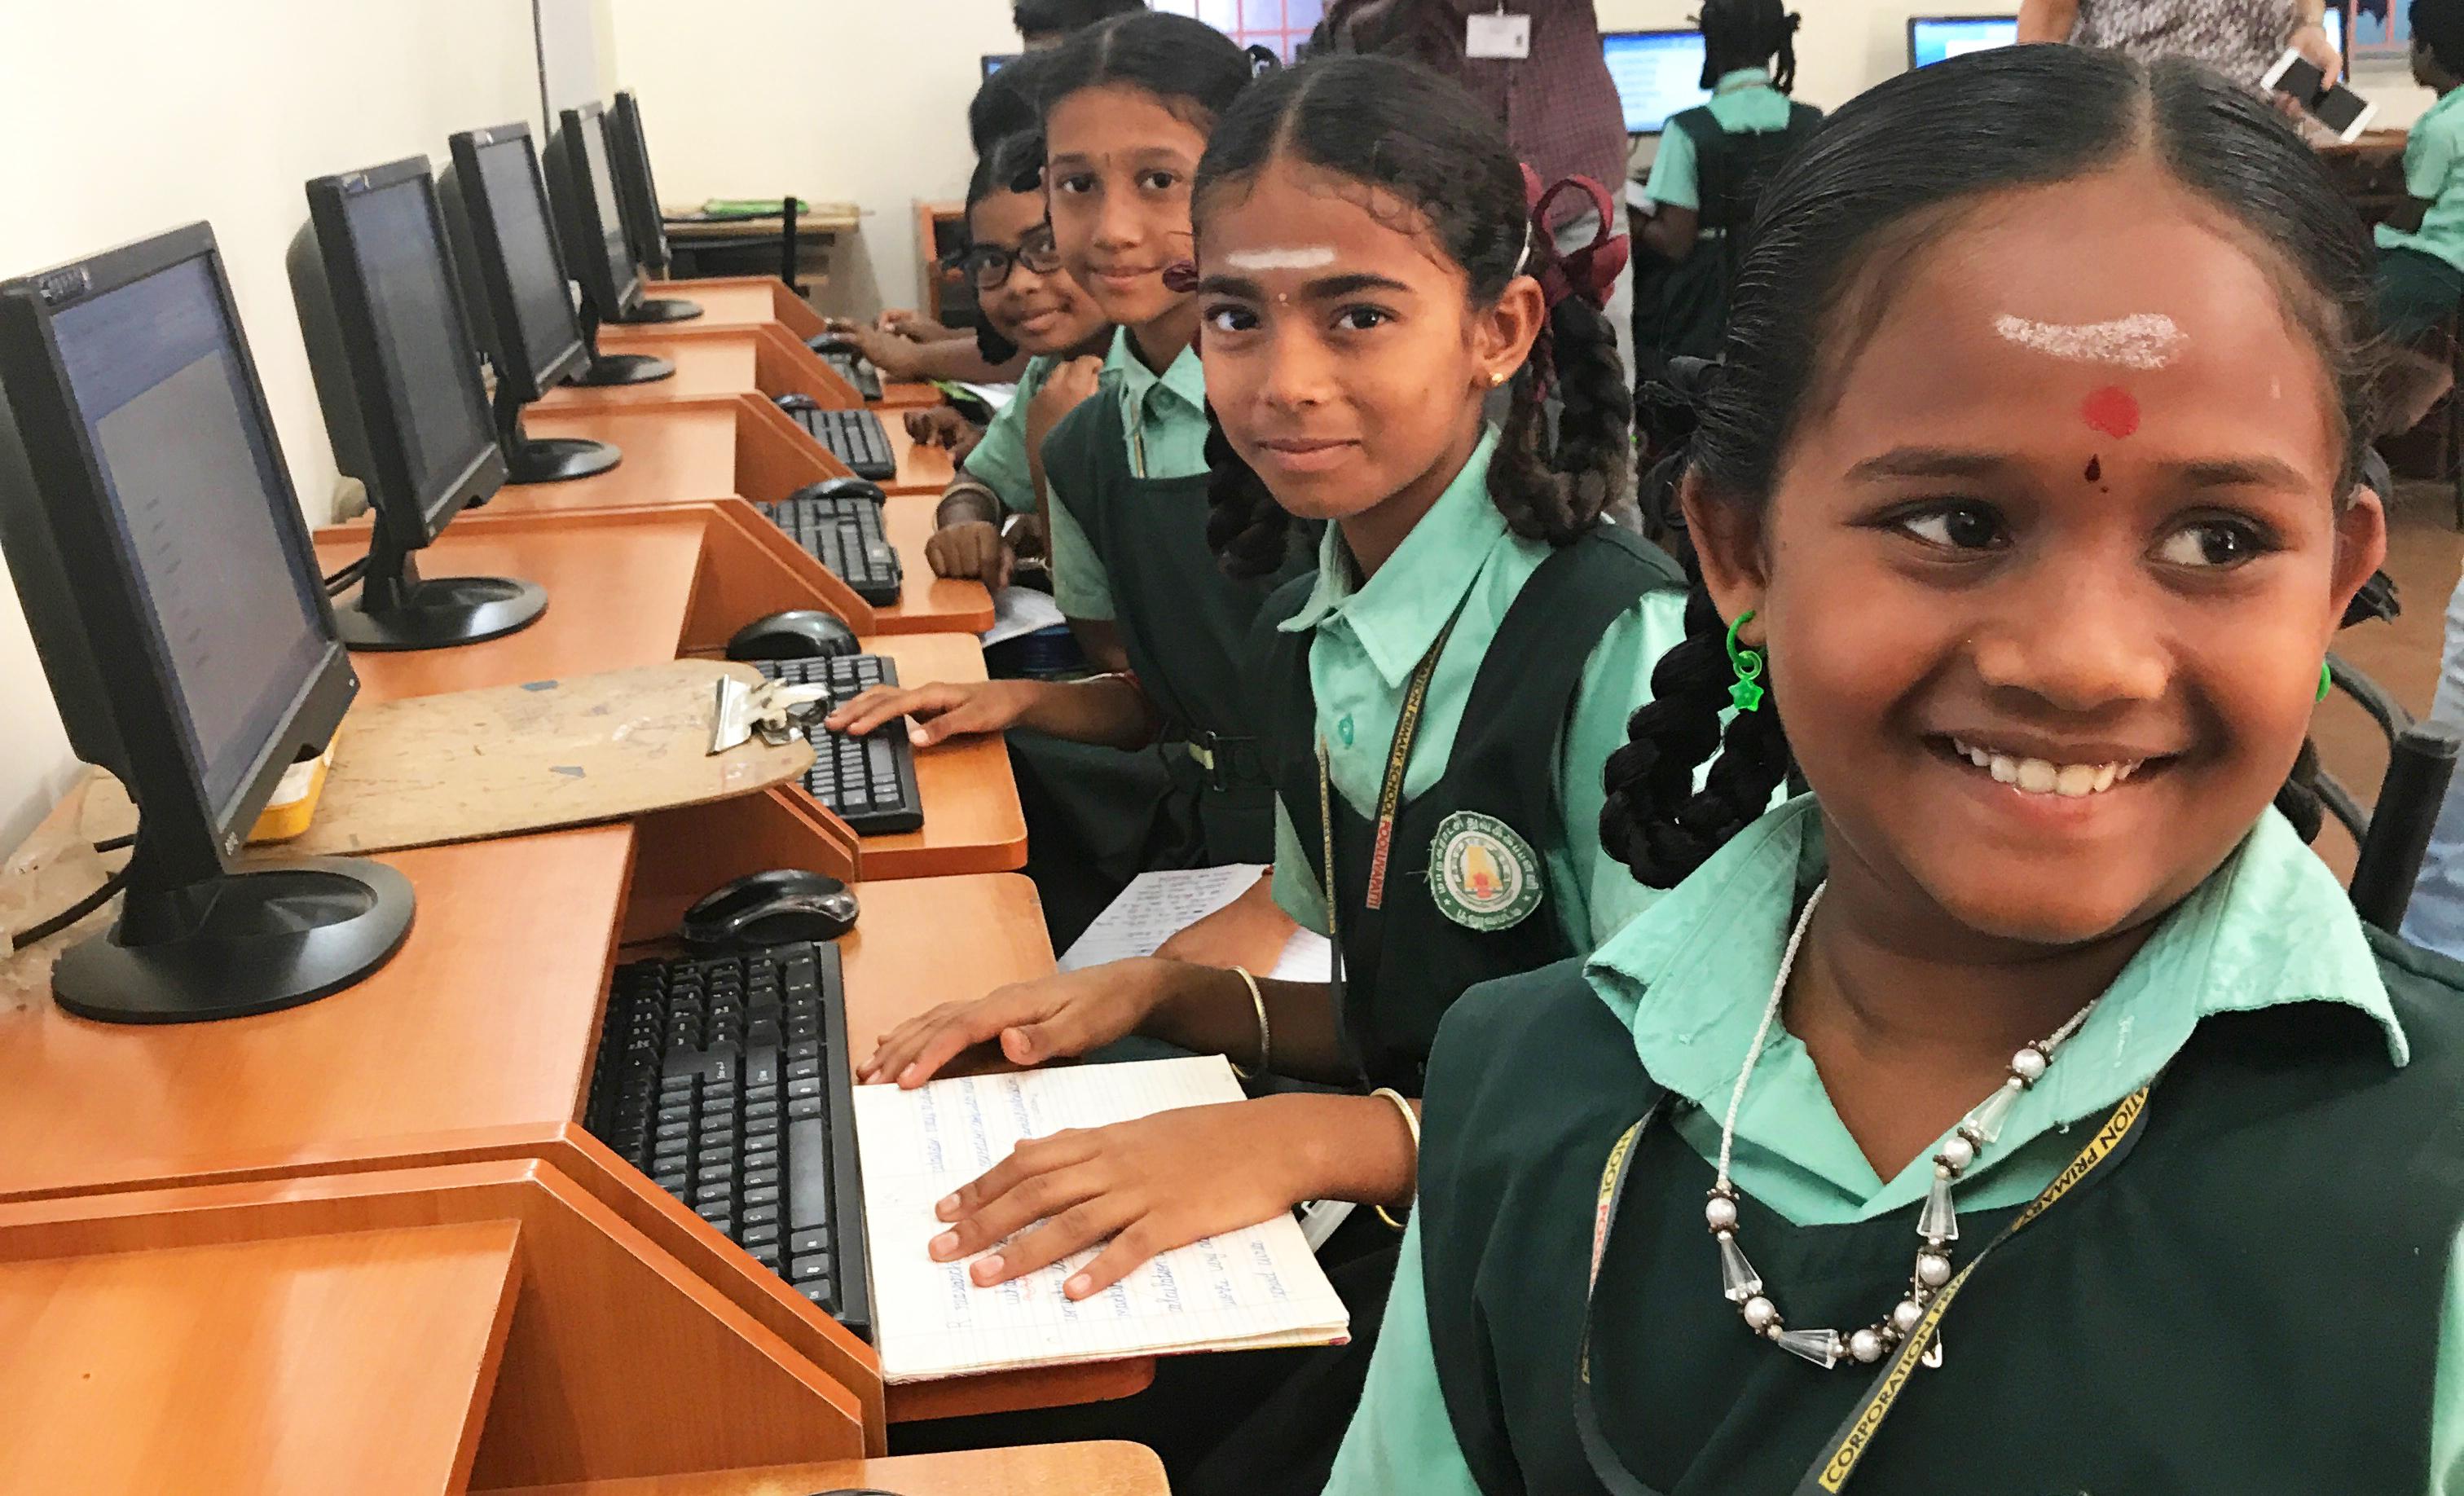 jbc wmh samenwerking india bangladesh